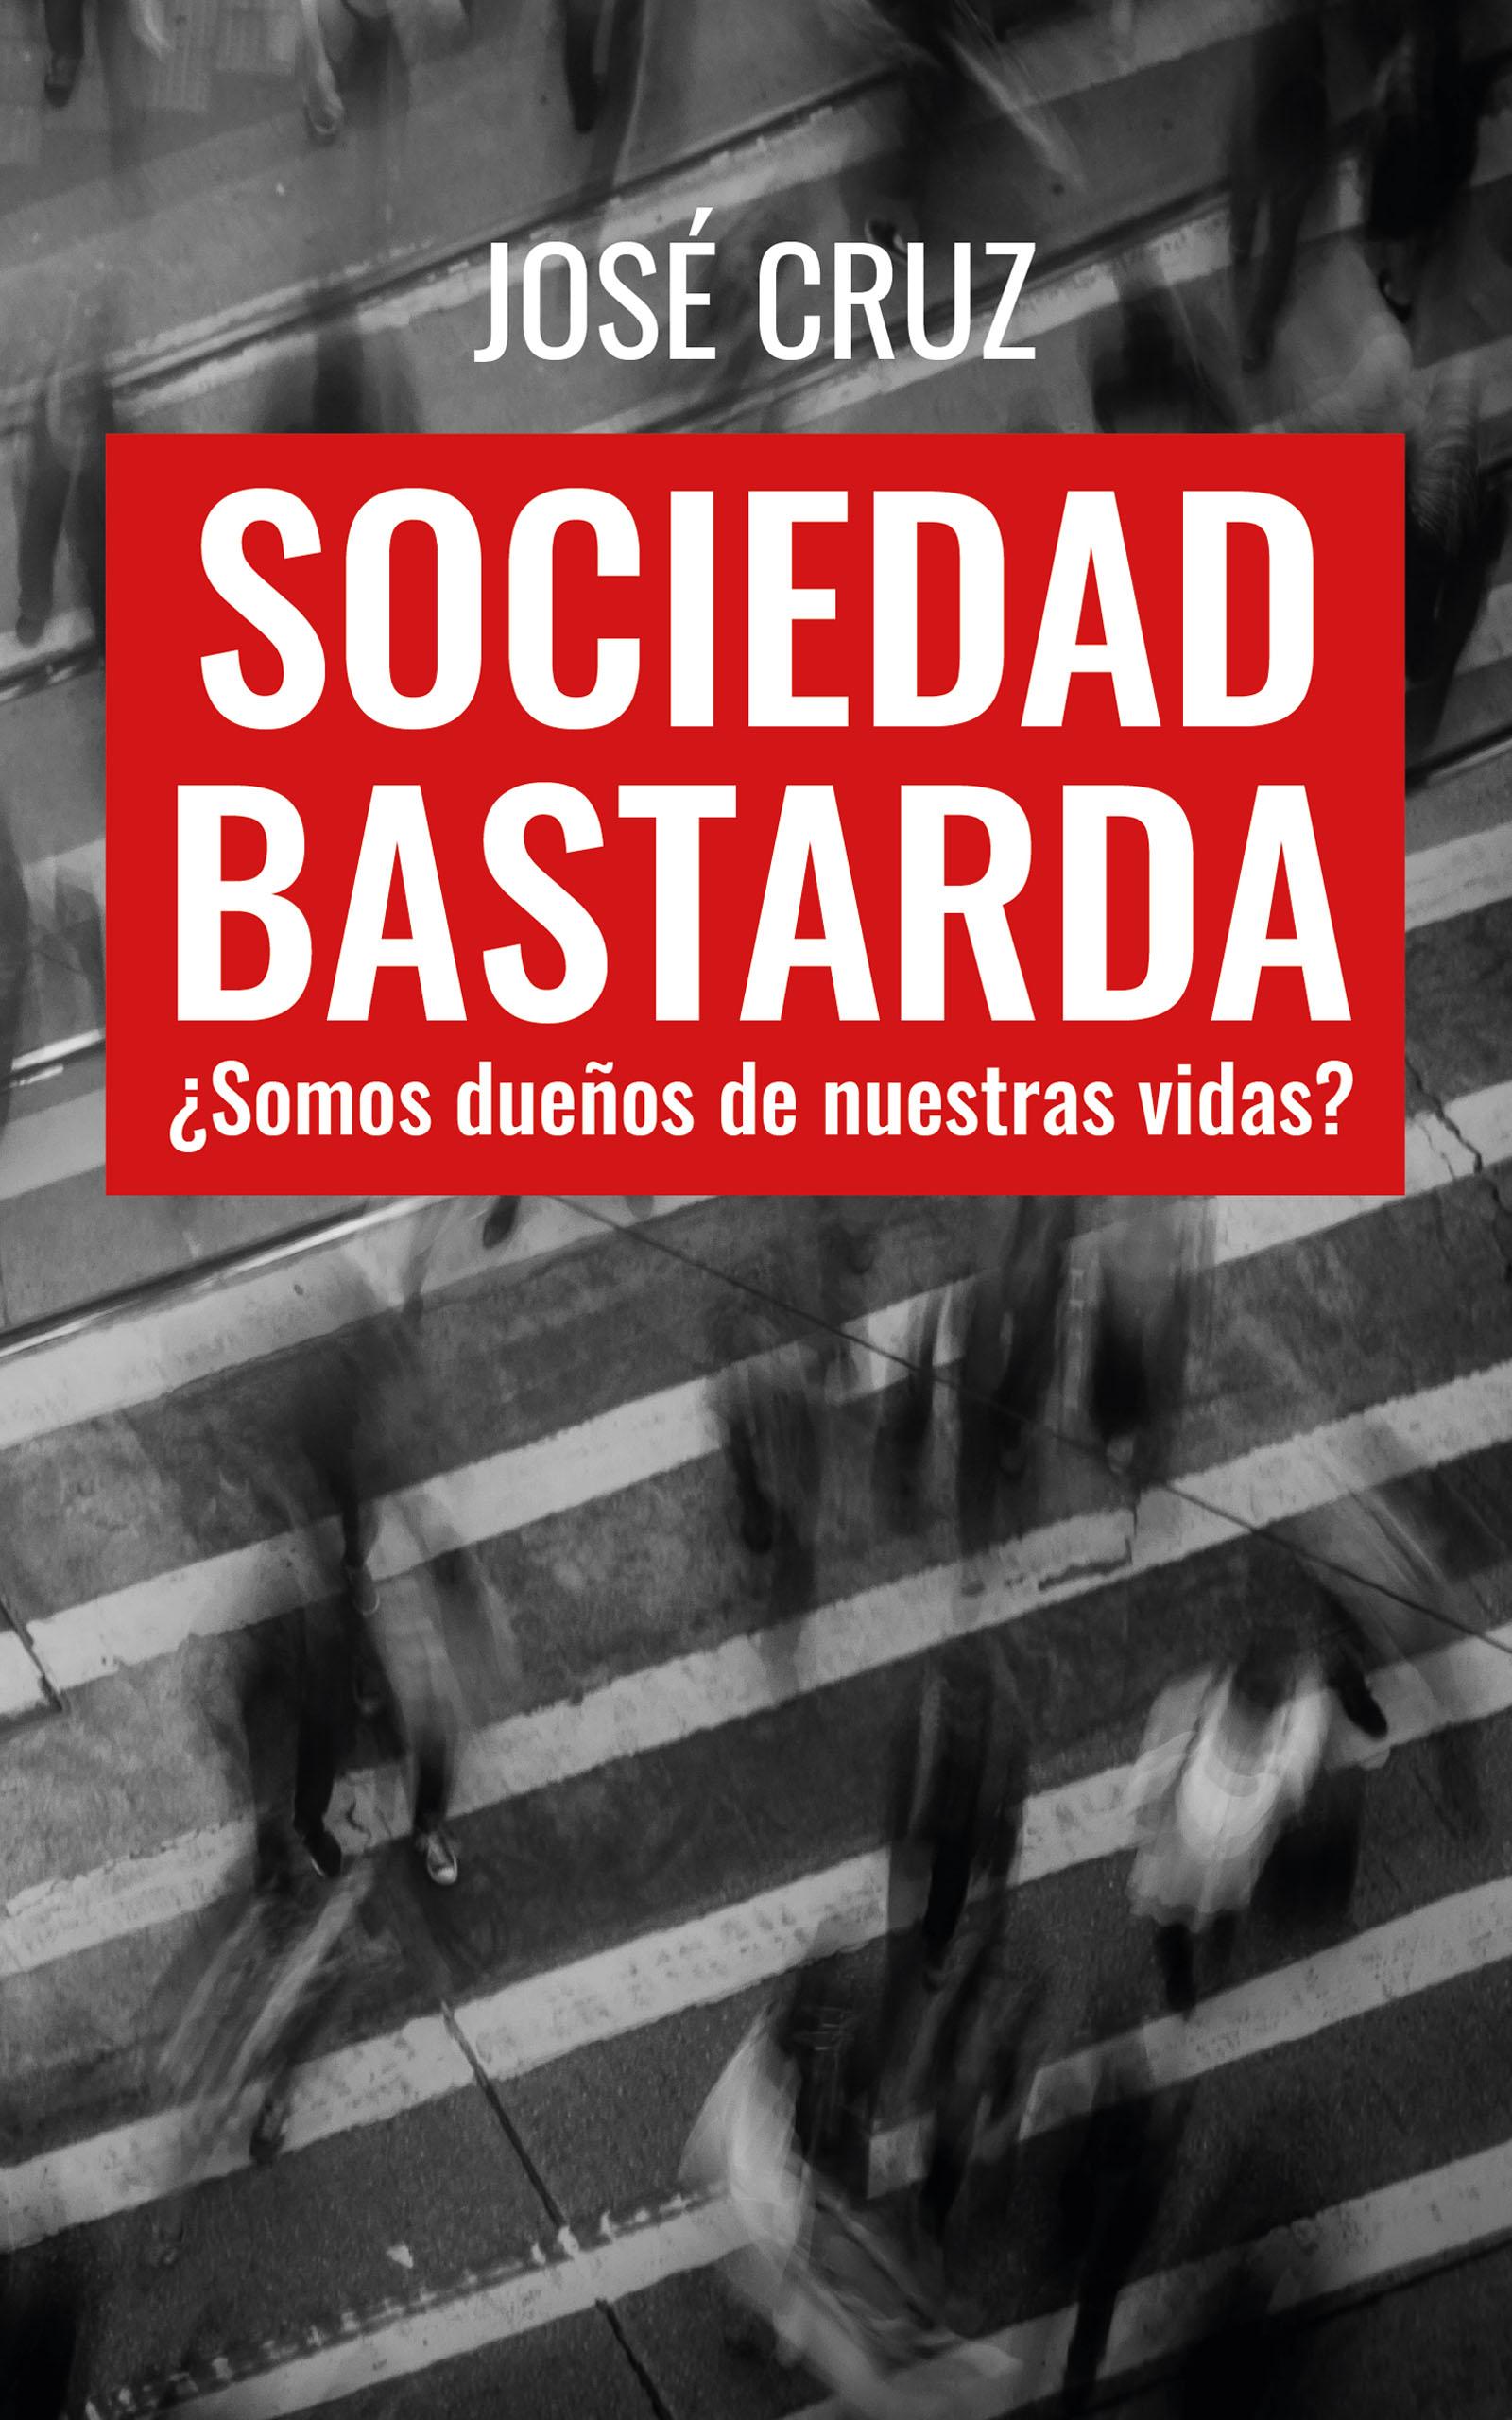 Sociedad bastarda